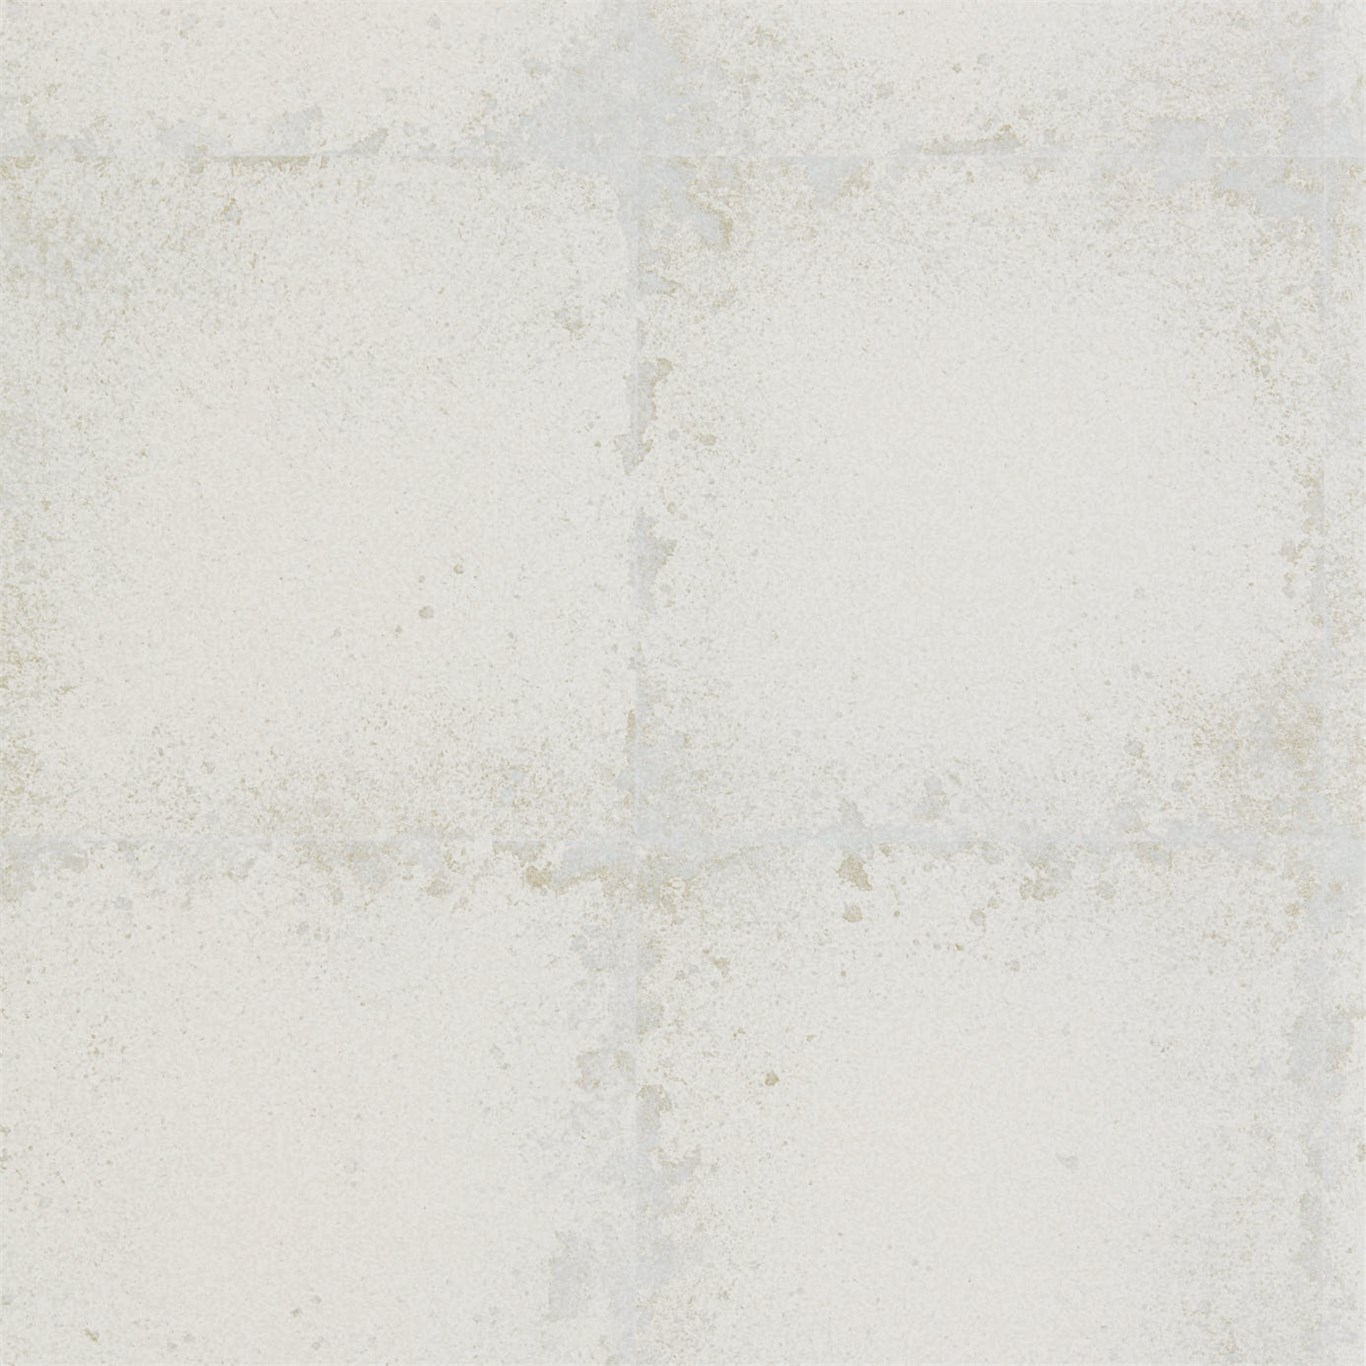 Английские обои Zoffany,  коллекция Akaishi, артикул312543